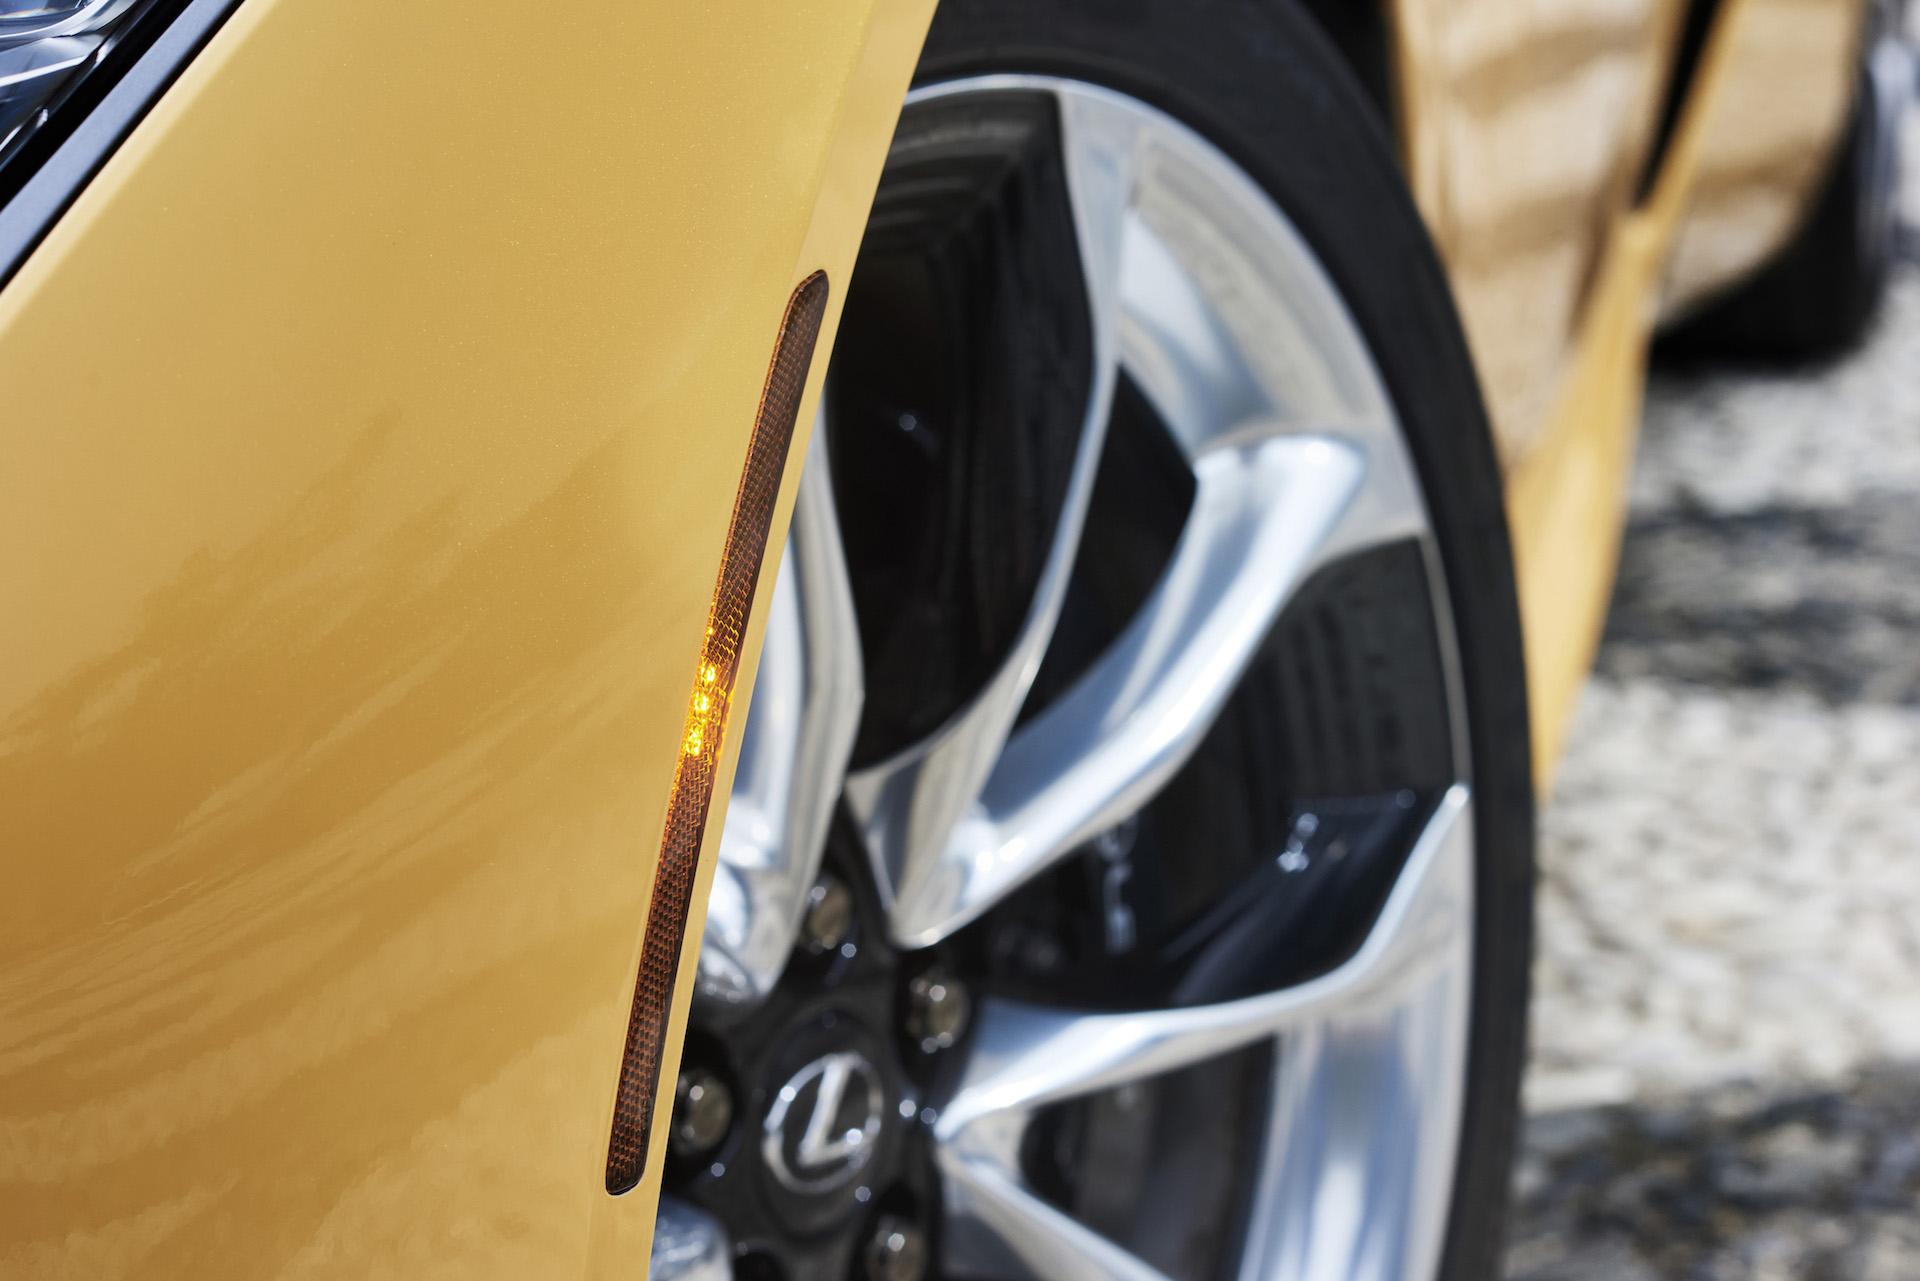 J.D. Power, 2018 Volvo XC60, Sierra Club sues EPA: What